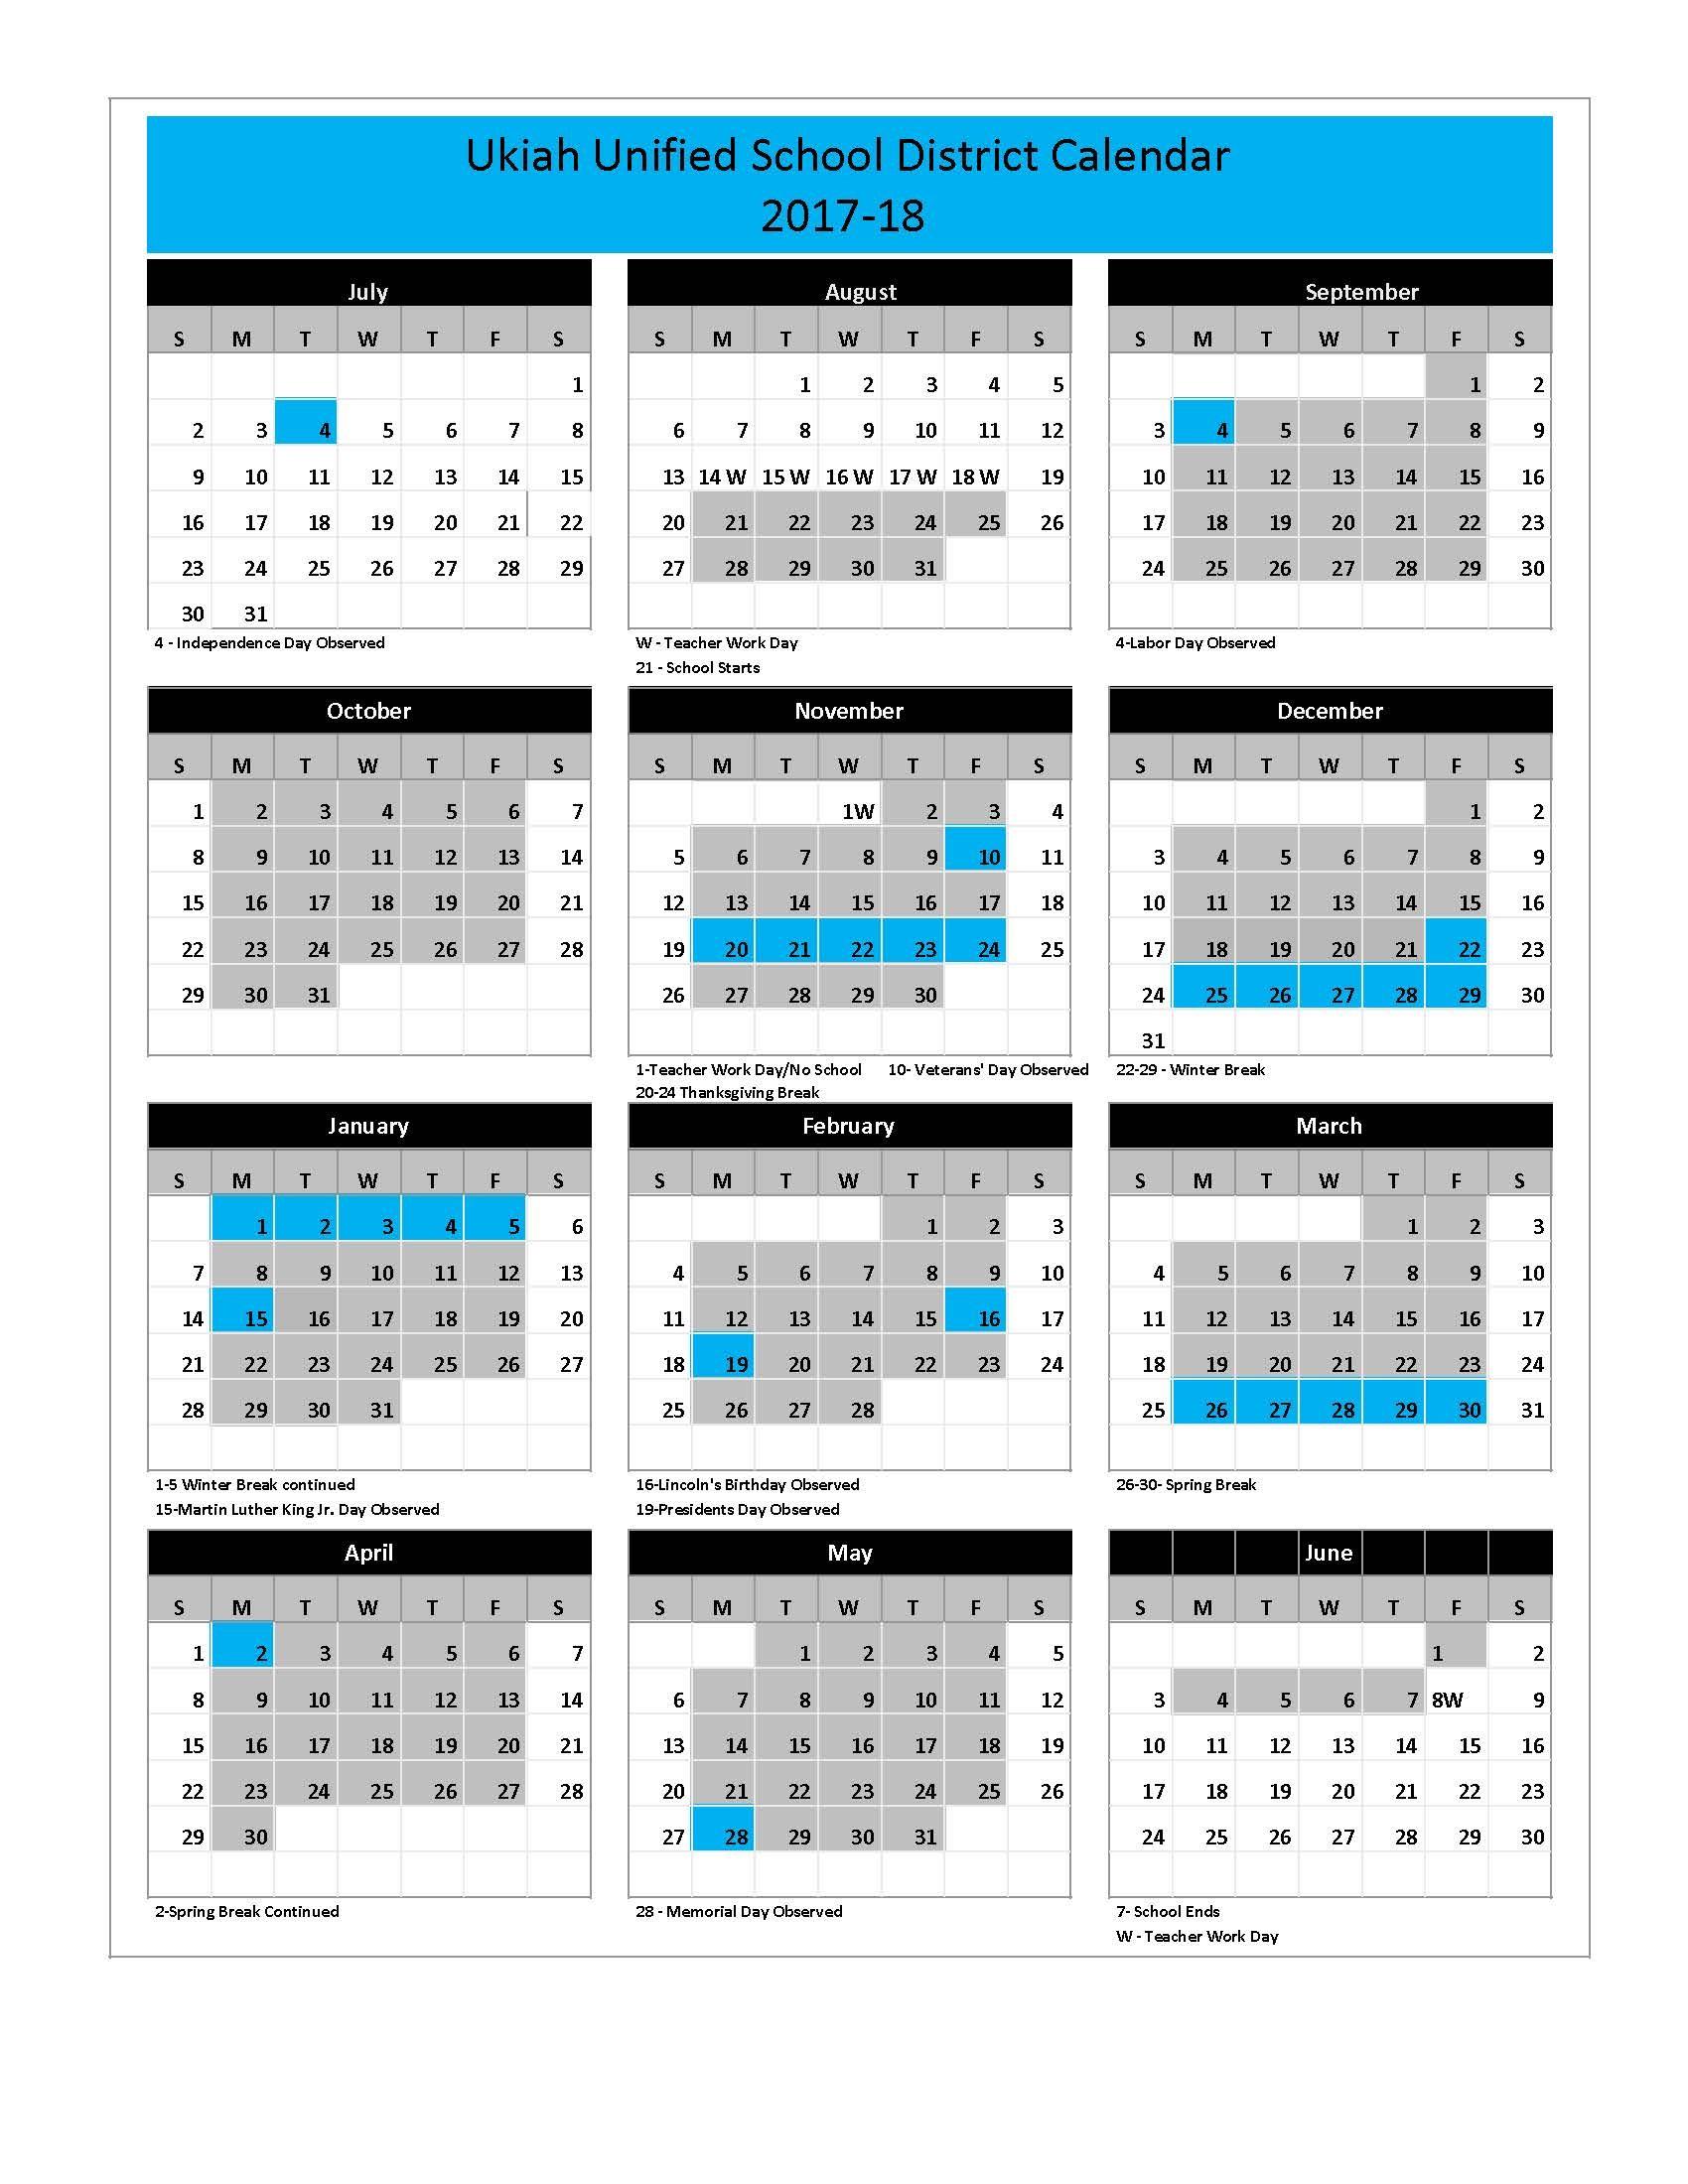 School Calendar 2017-18